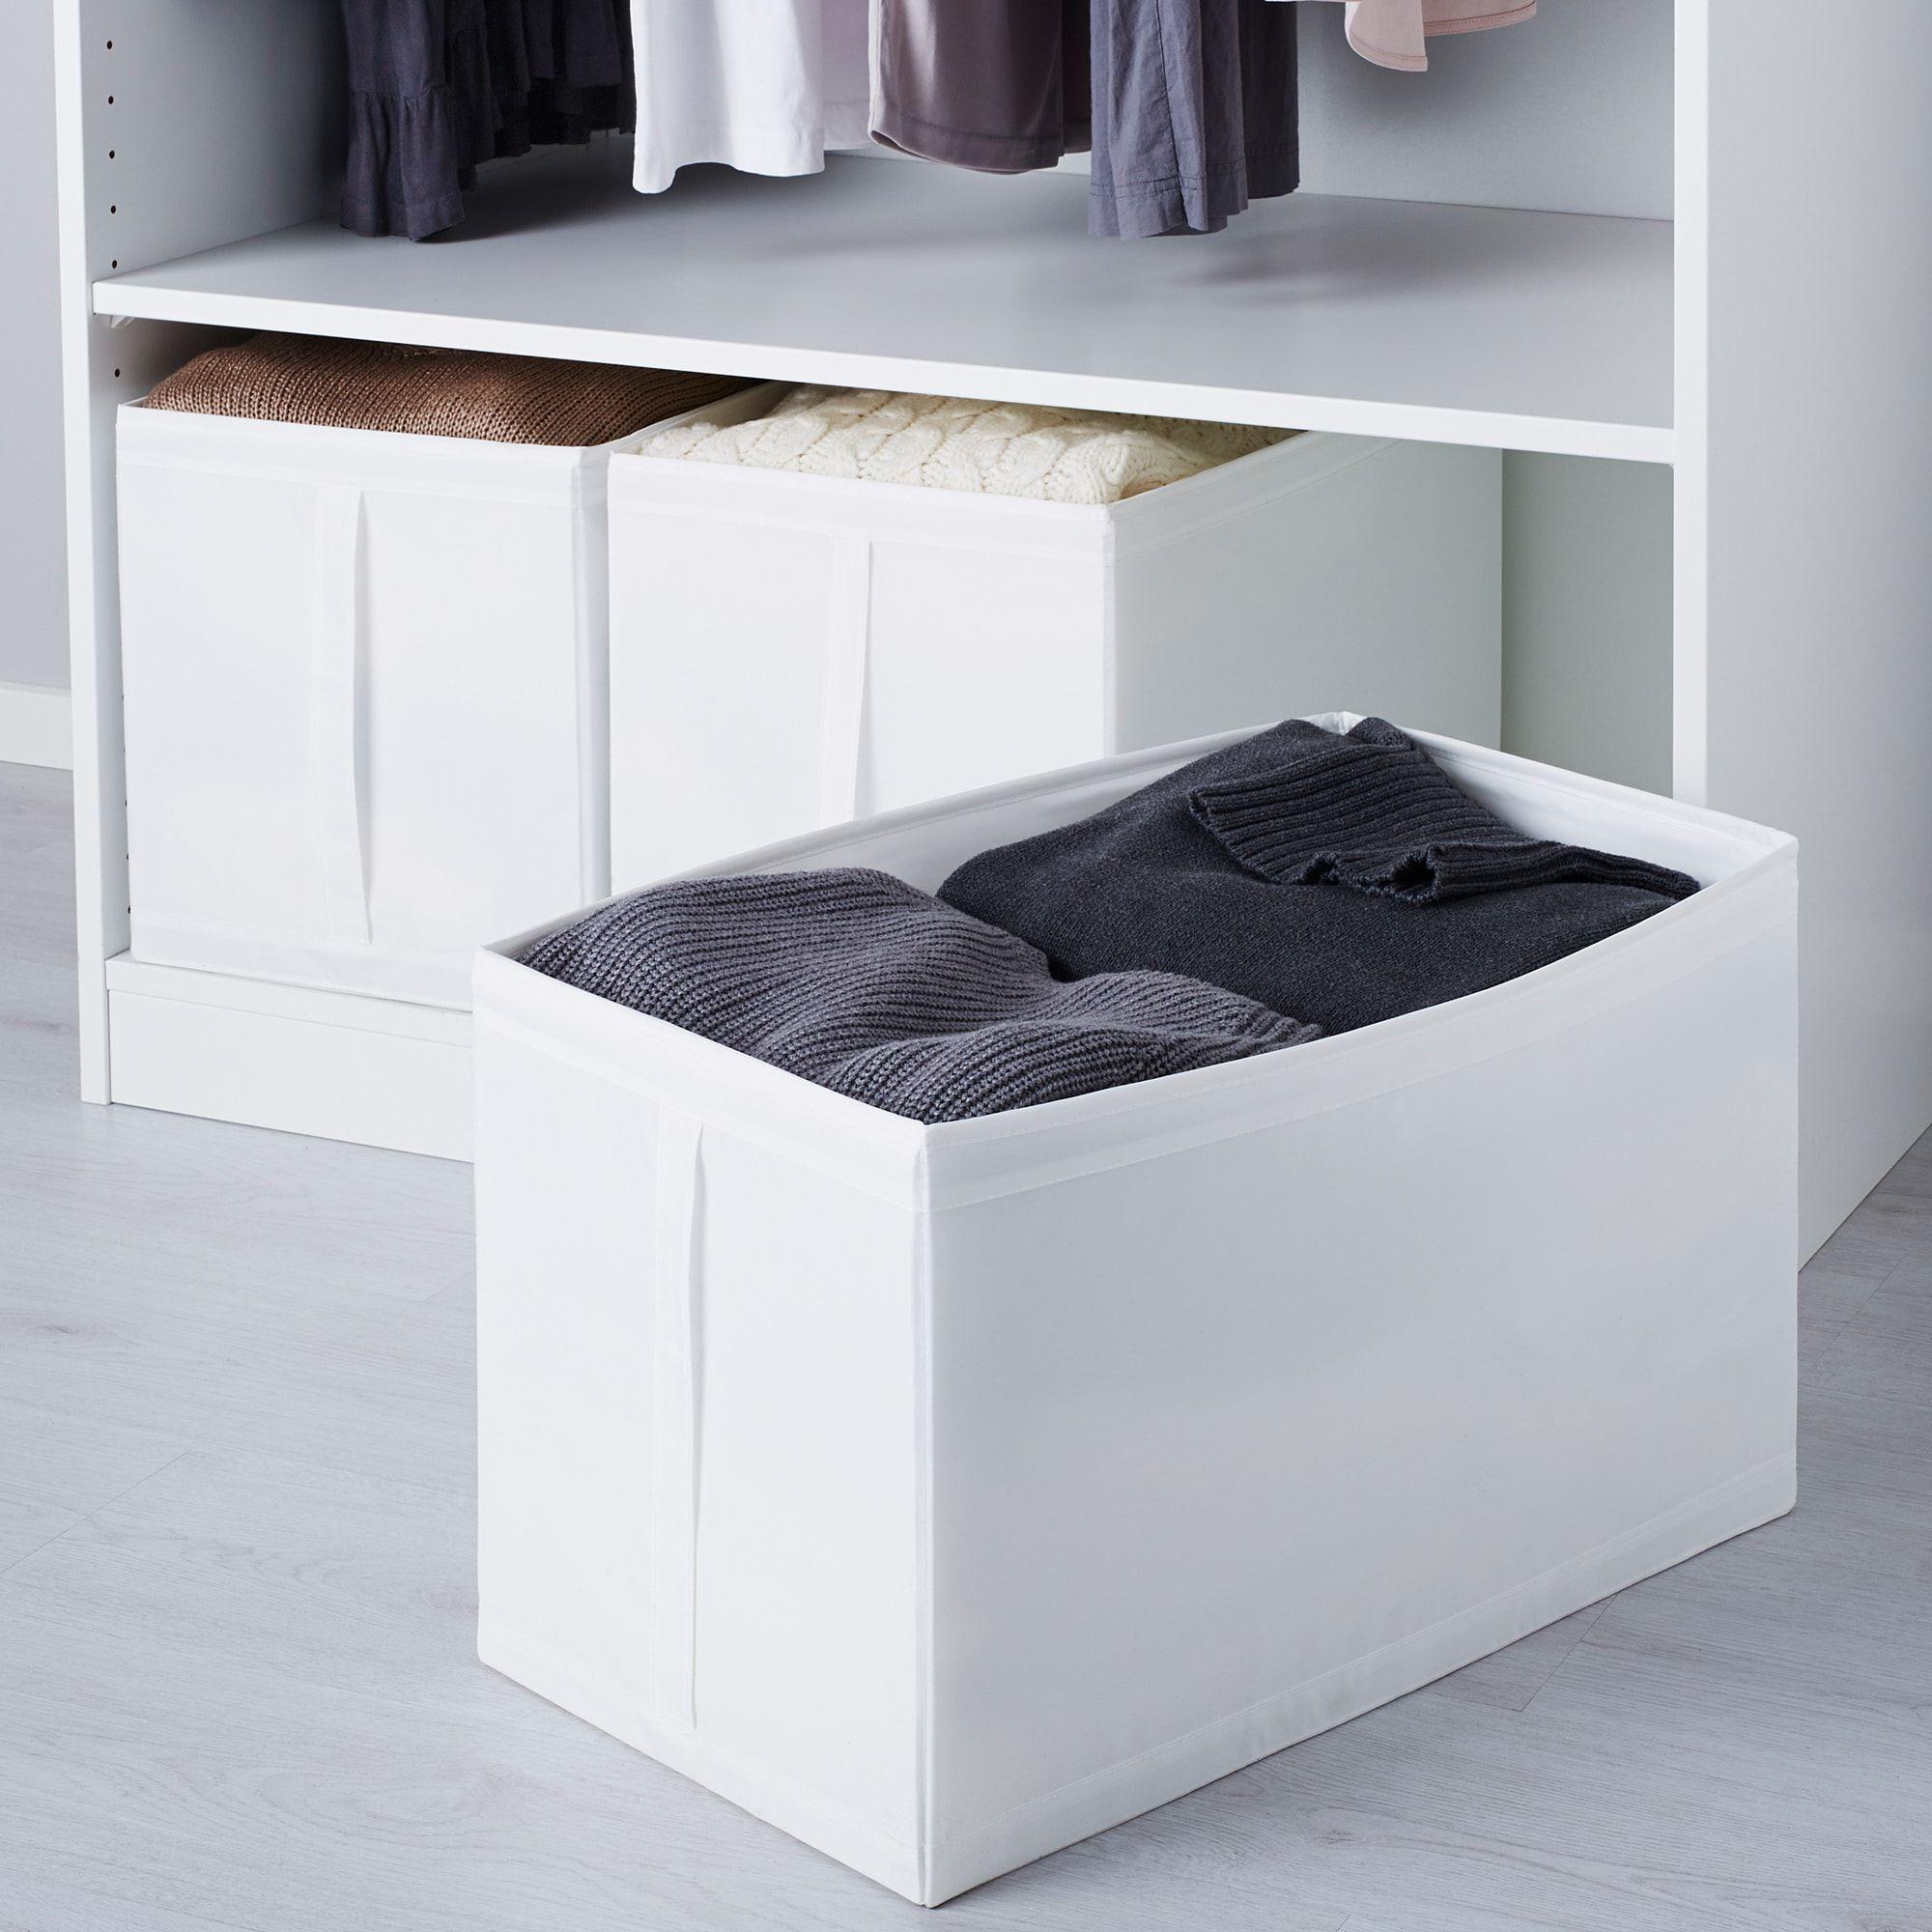 Skubb Rangement Tissu Blanc 31x55x33 Cm Ikea En 2020 Rangement Tissu Tissu Blanc Rangement Chambre